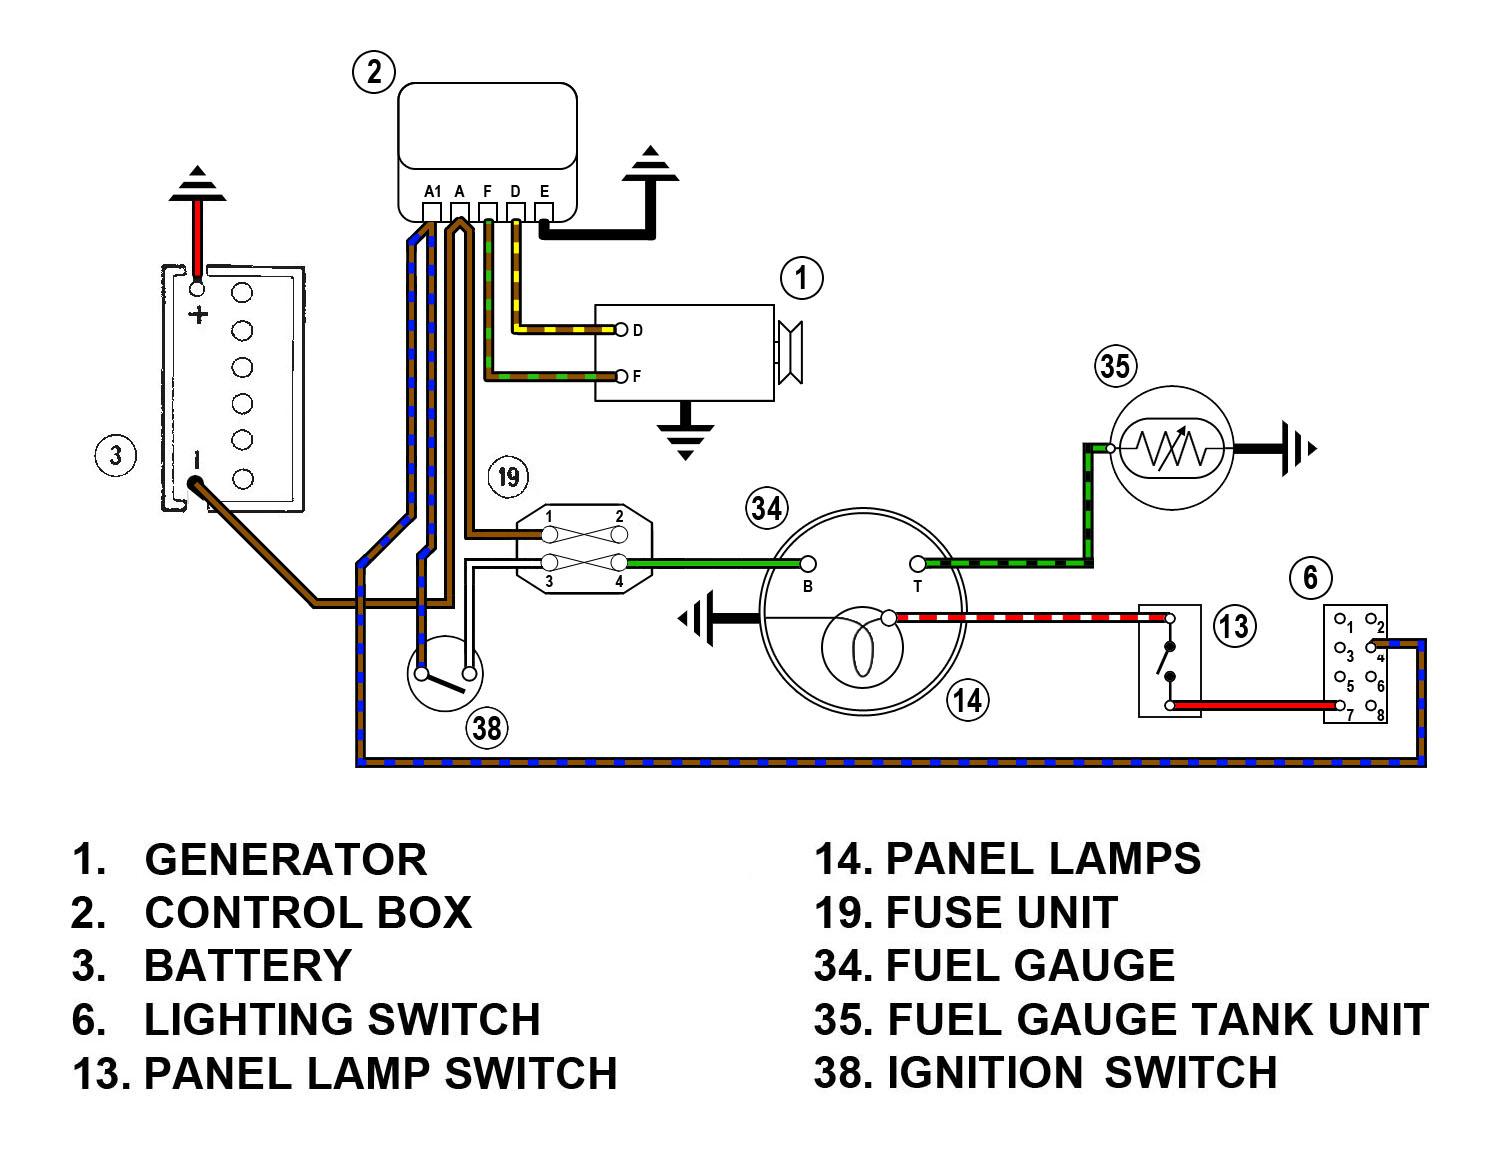 auto meter tachometer wiring diagram zw 8263  auto meter sport comp wiring diagram free picture wiring  auto meter sport comp wiring diagram